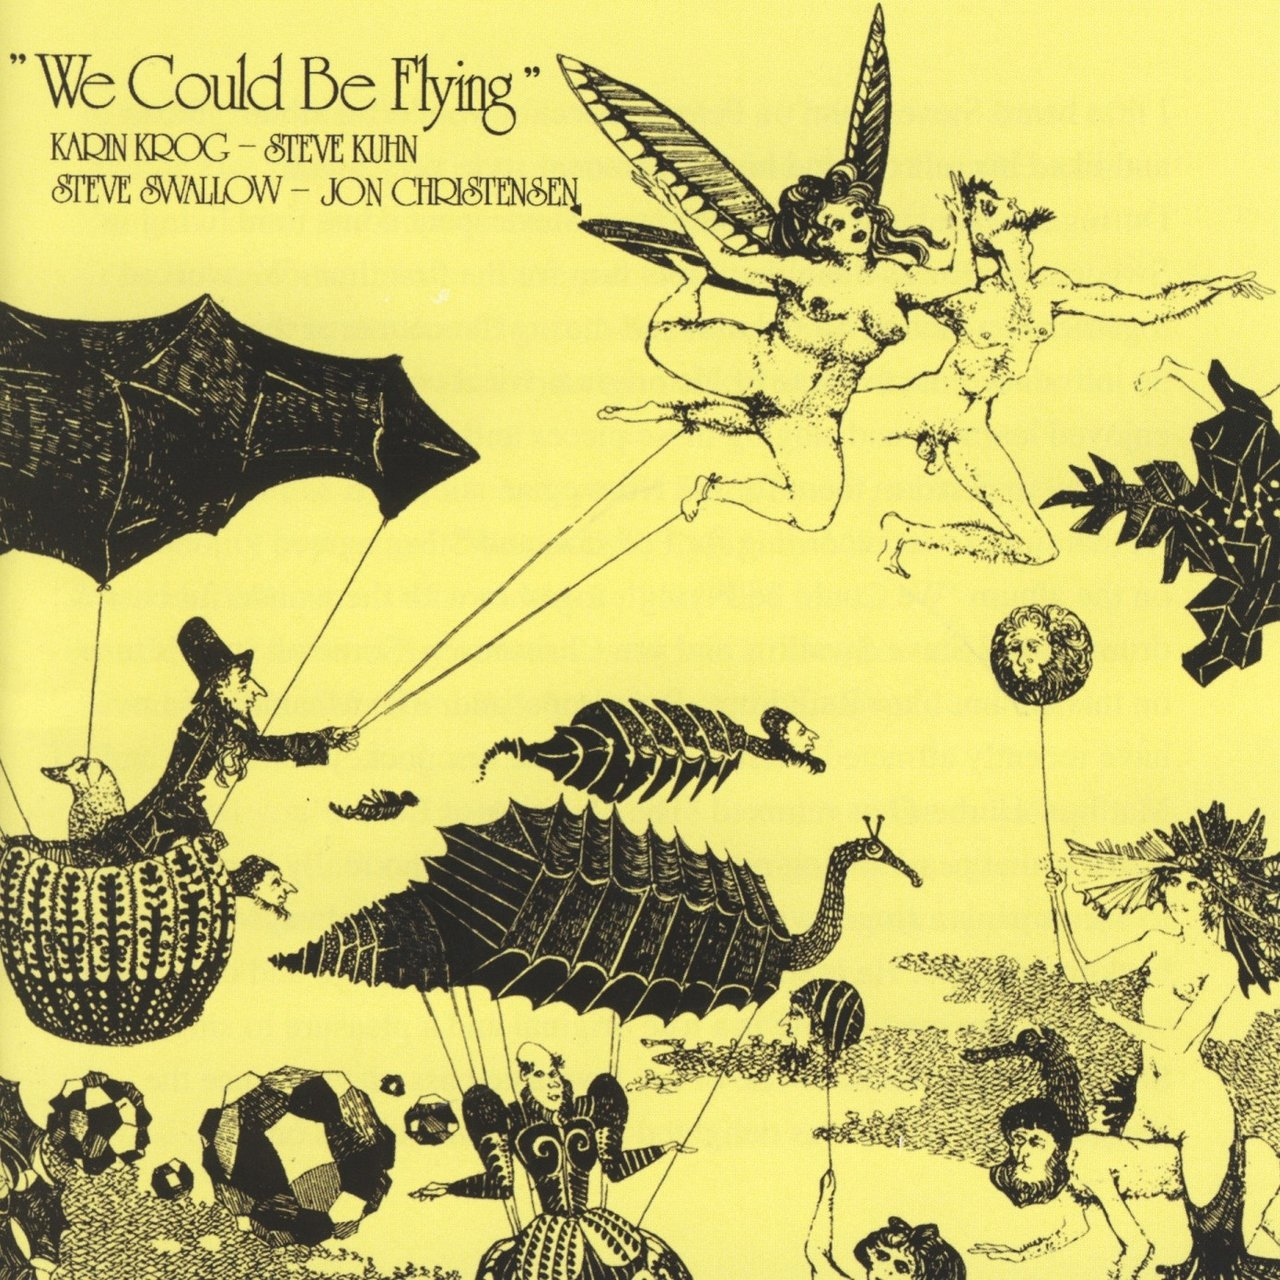 Karin Krog/Kuhn/Swallow/Christensen - We could be flying [LP]